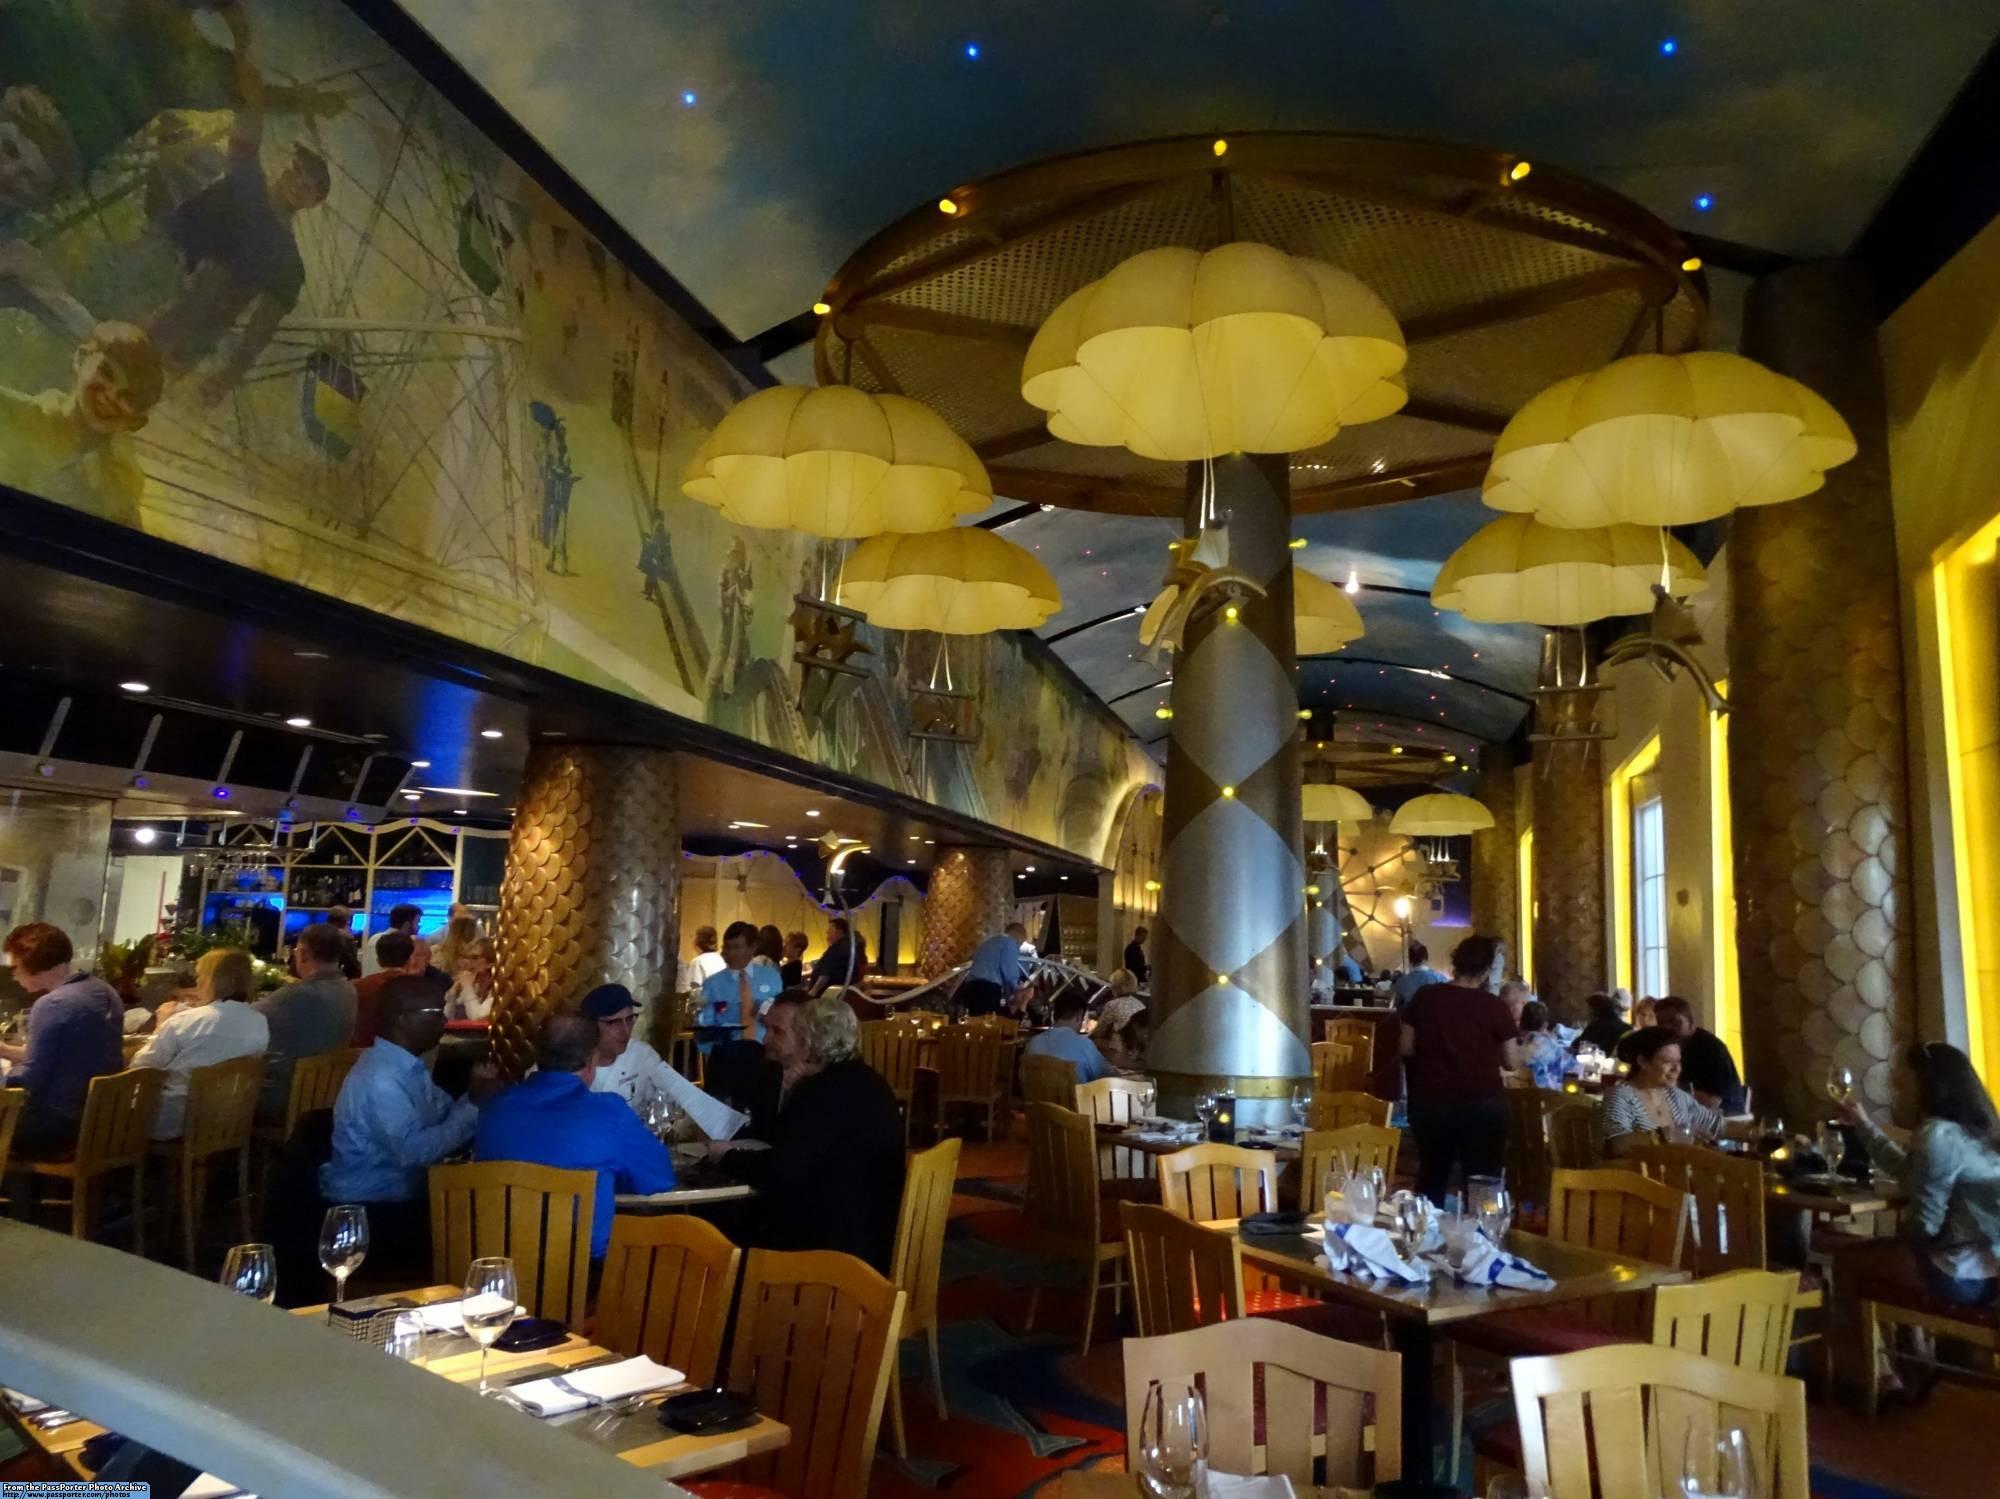 BoardWalk - Flying Fish Cafe